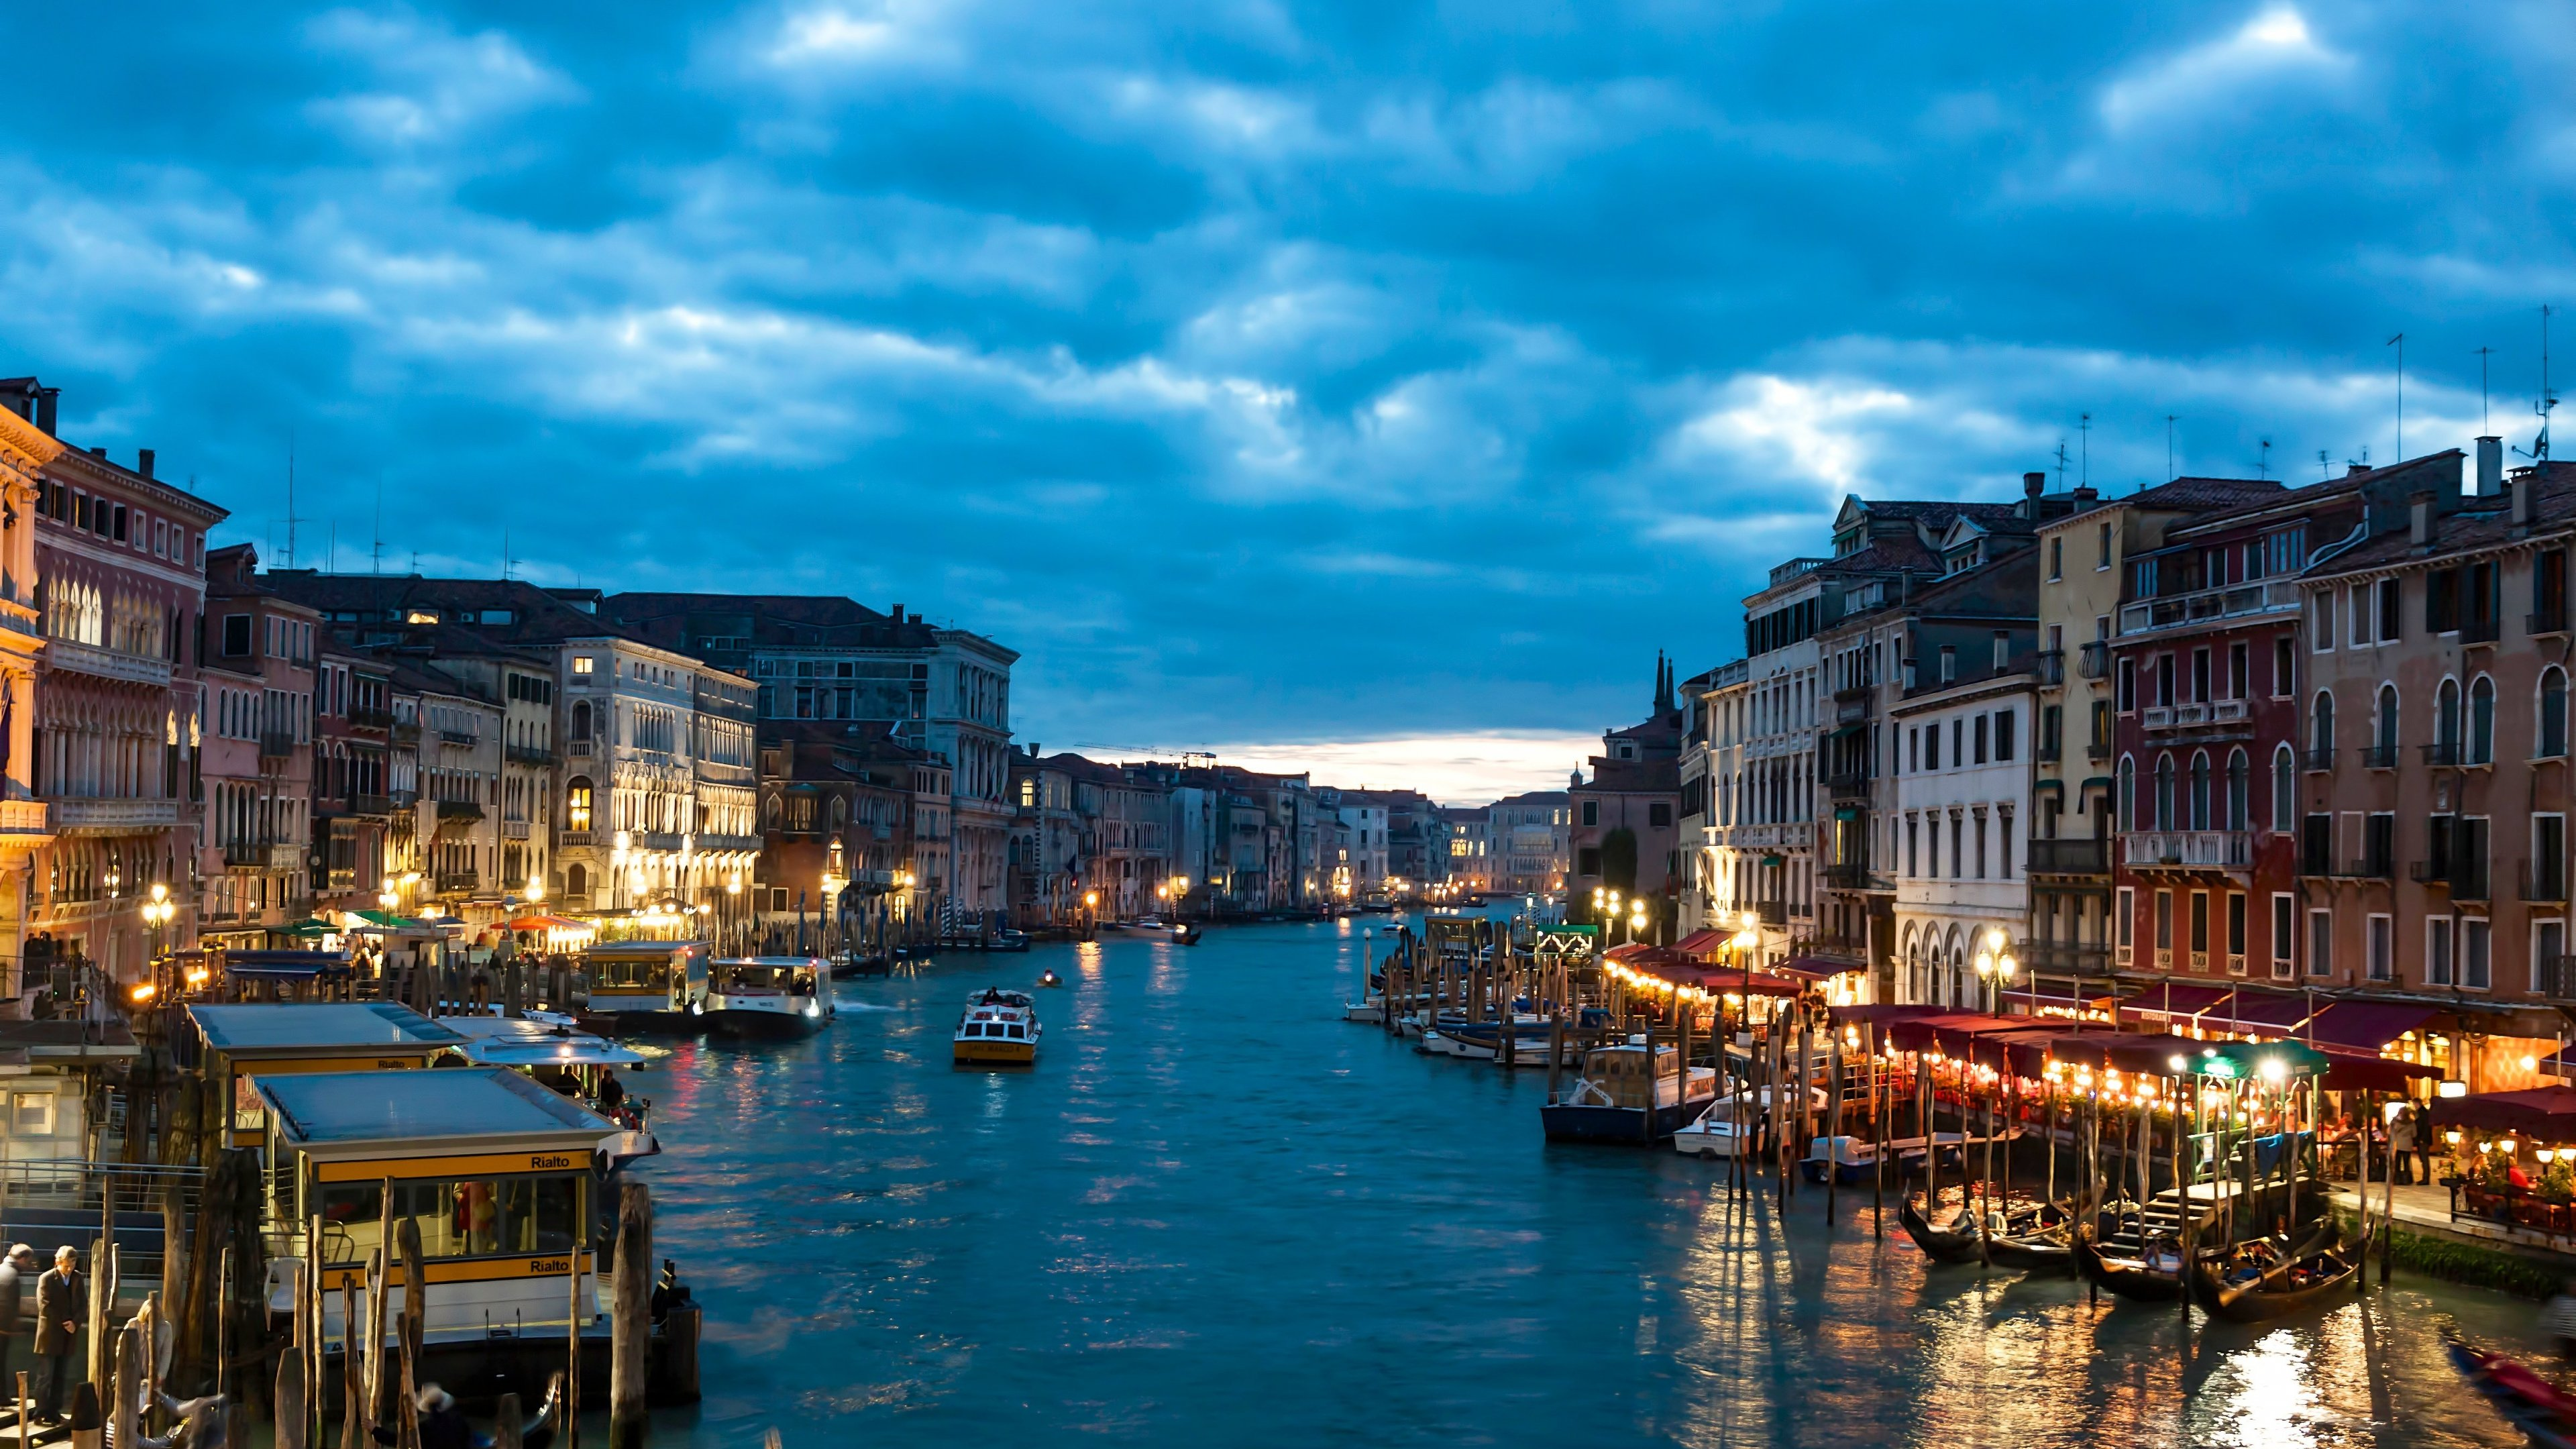 Venice 4K Ultra HD Wallpaper [3840x2160]